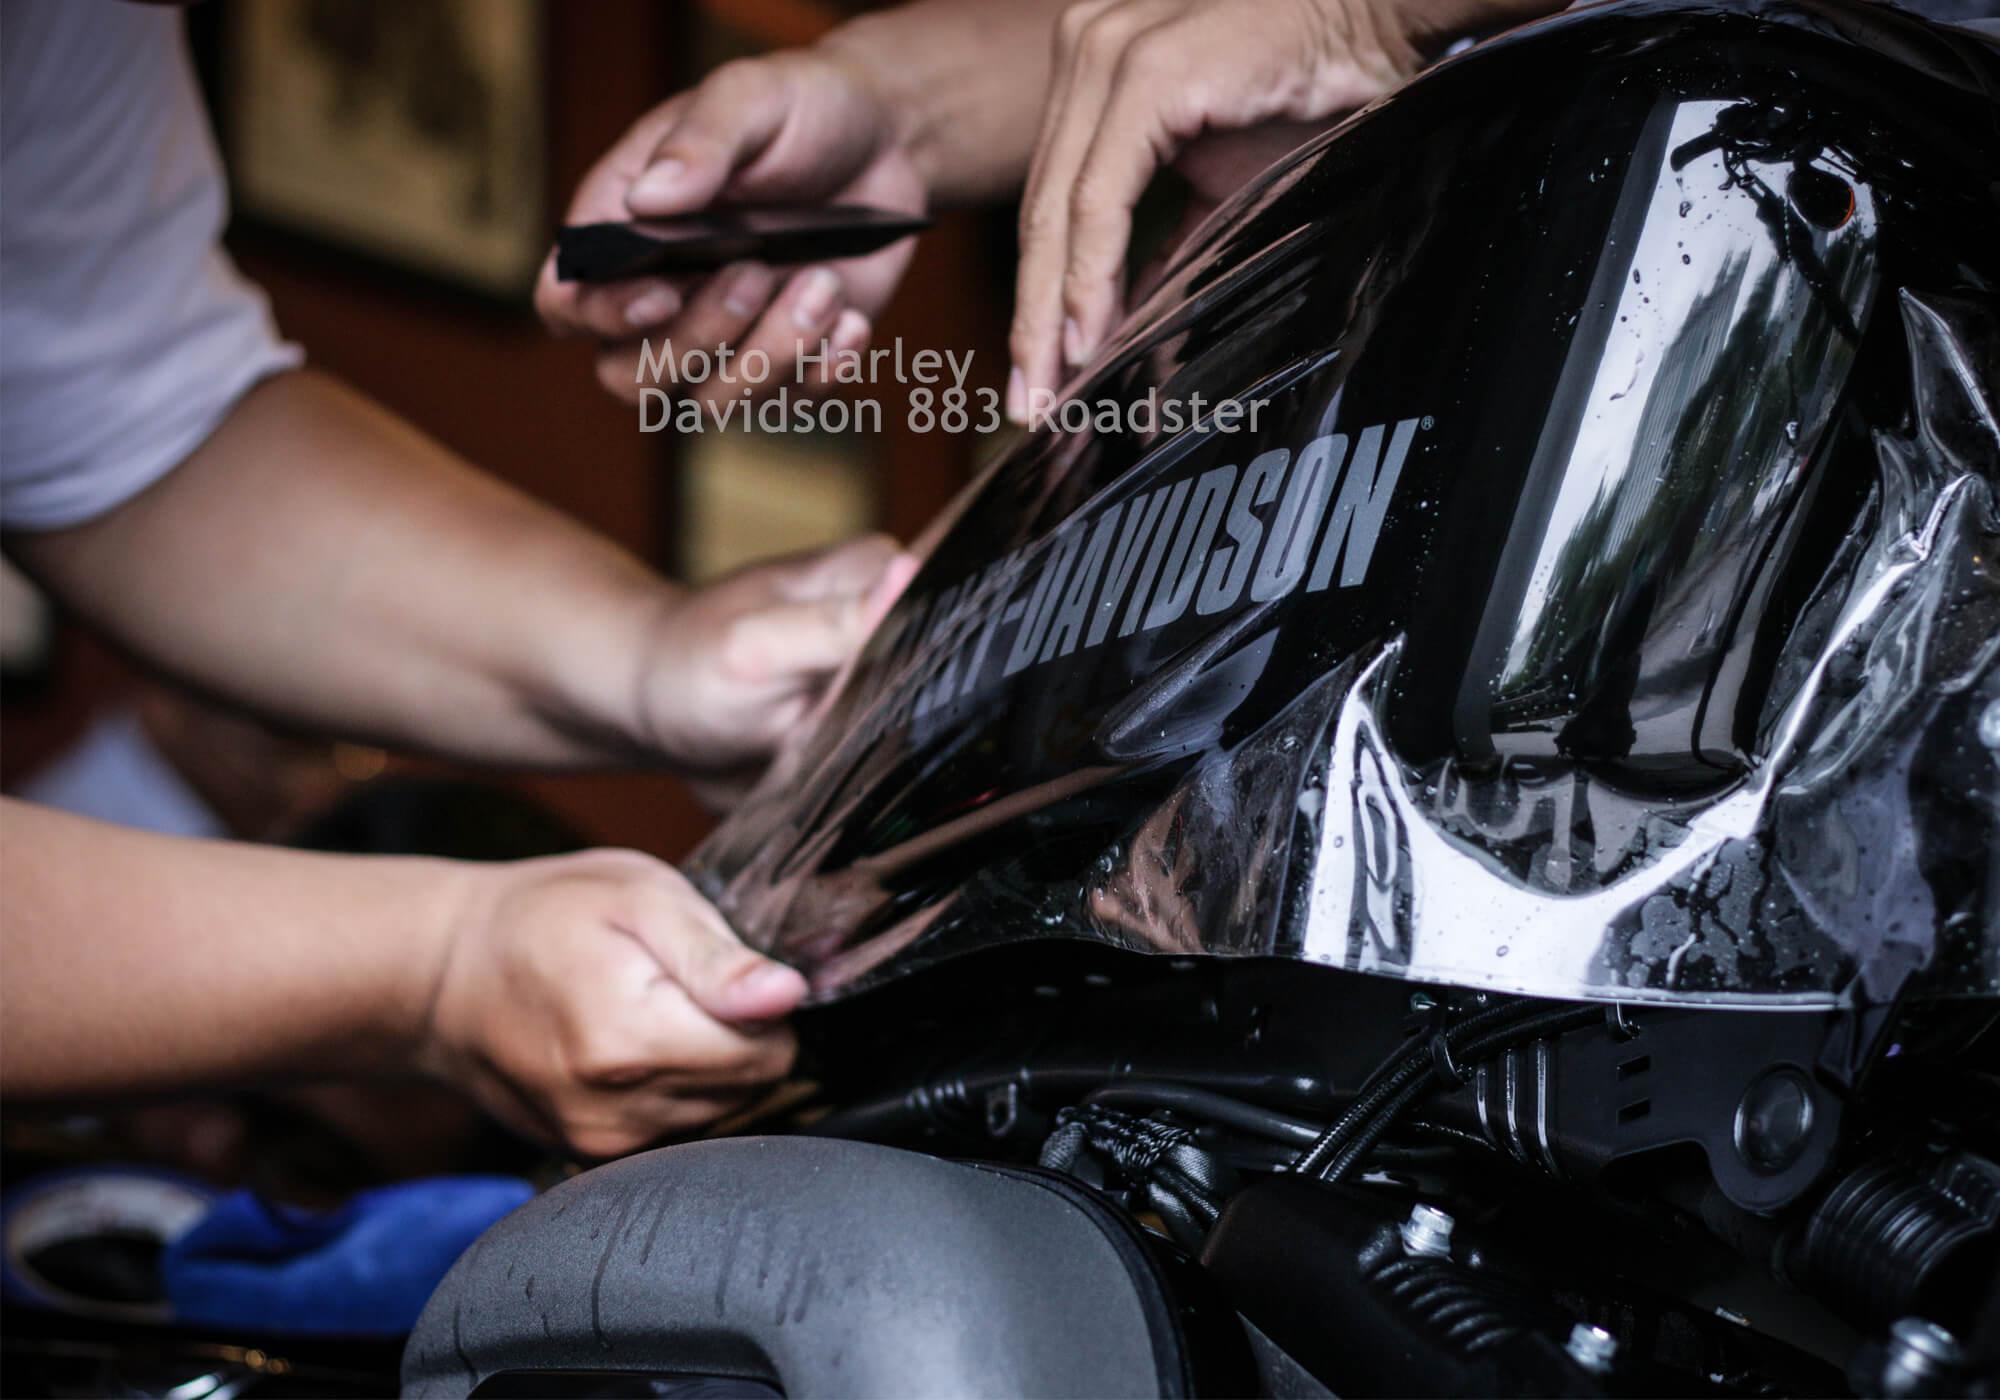 Moto Harley Davidson 883 Roadster